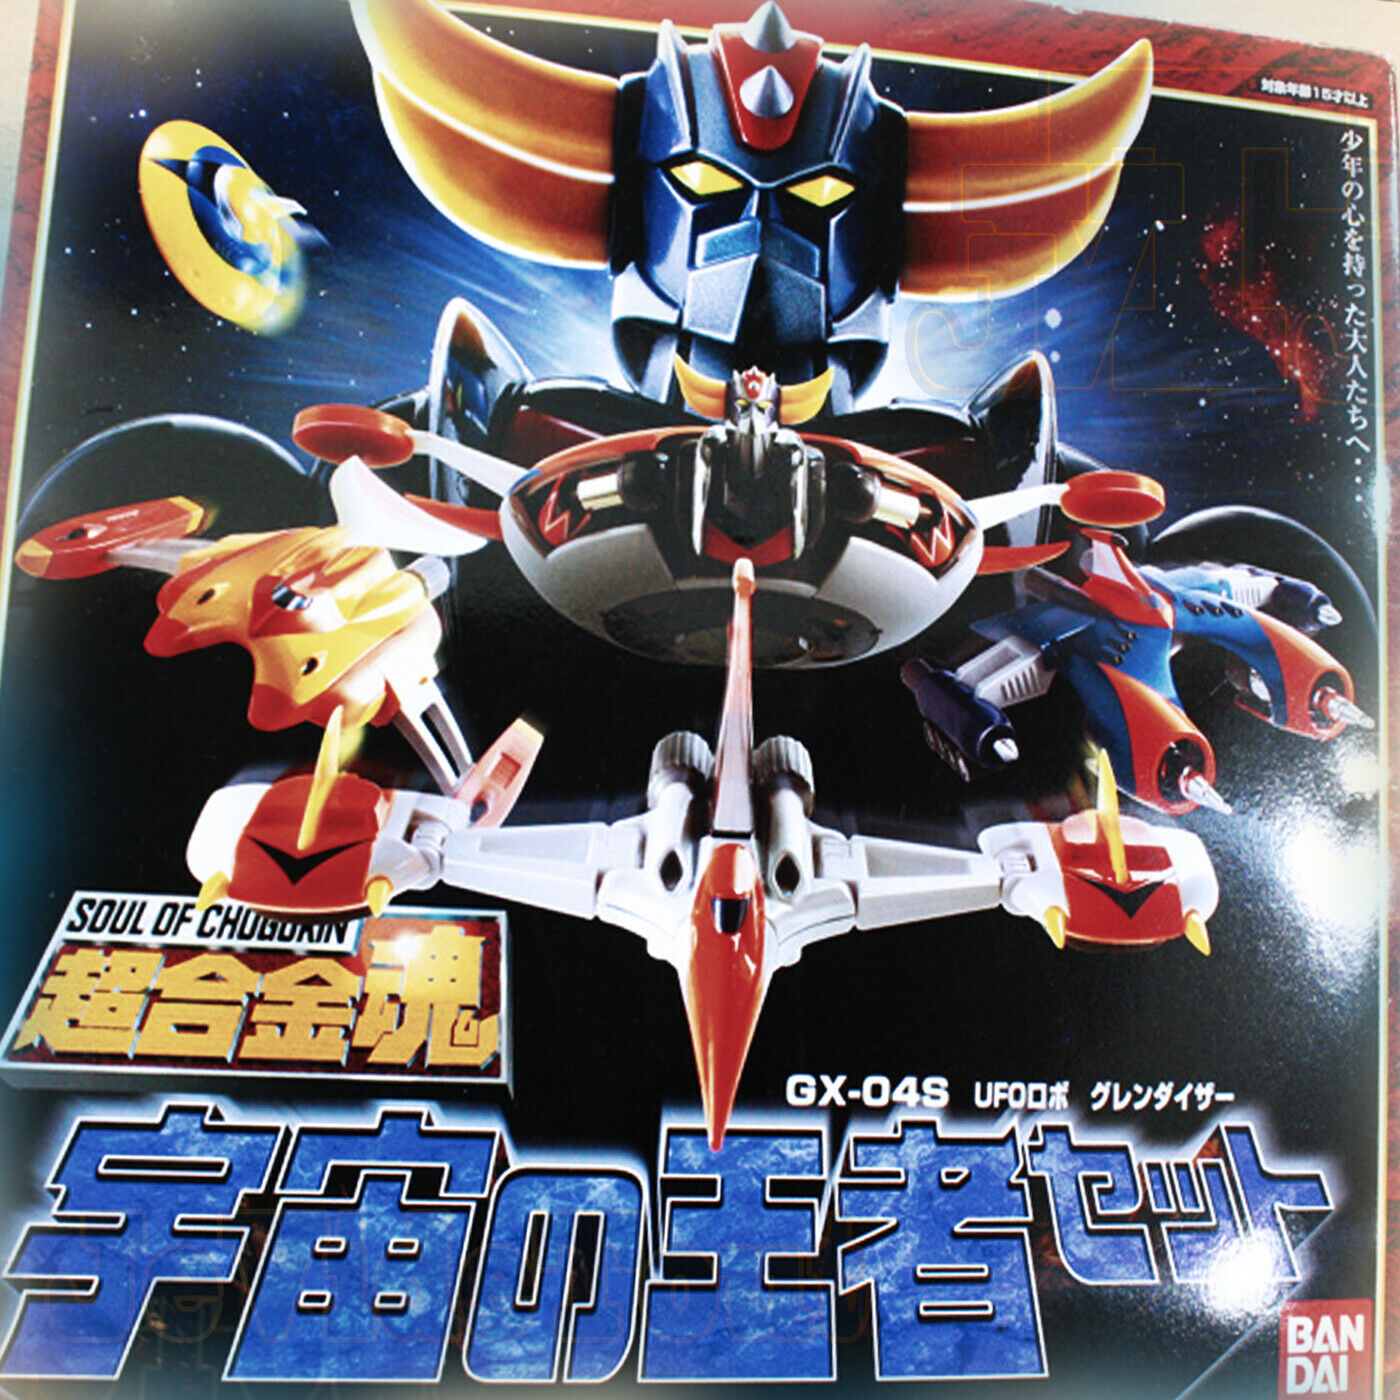 oroorak - GX 04S - Bandai - Soul of Chogokin - Grendizer - UFO